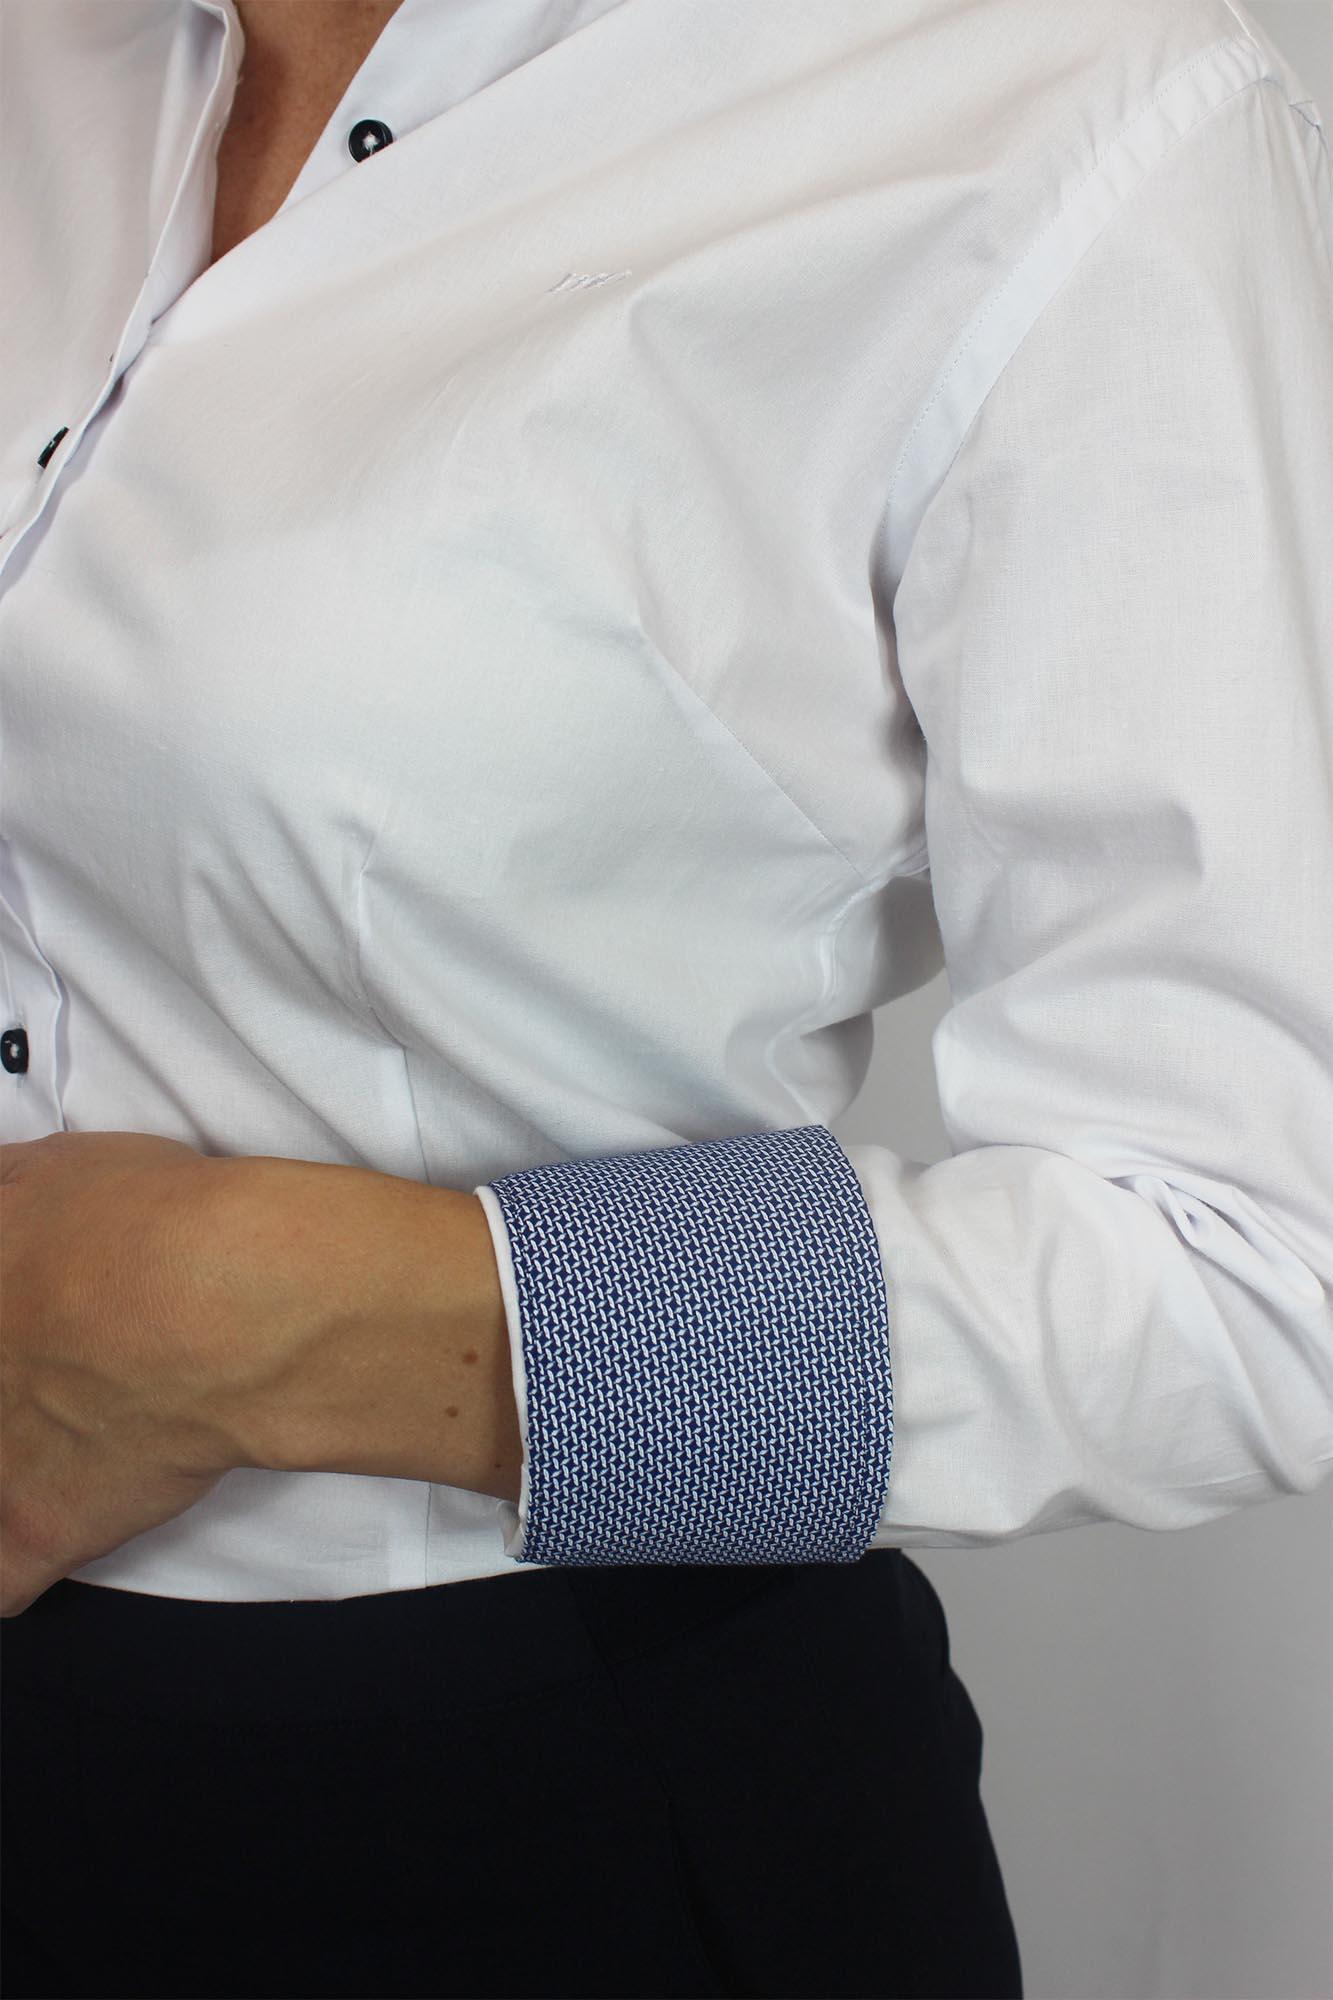 Camisa Social ML Slim Fit Básica Detalhe MO Feminina - Branca